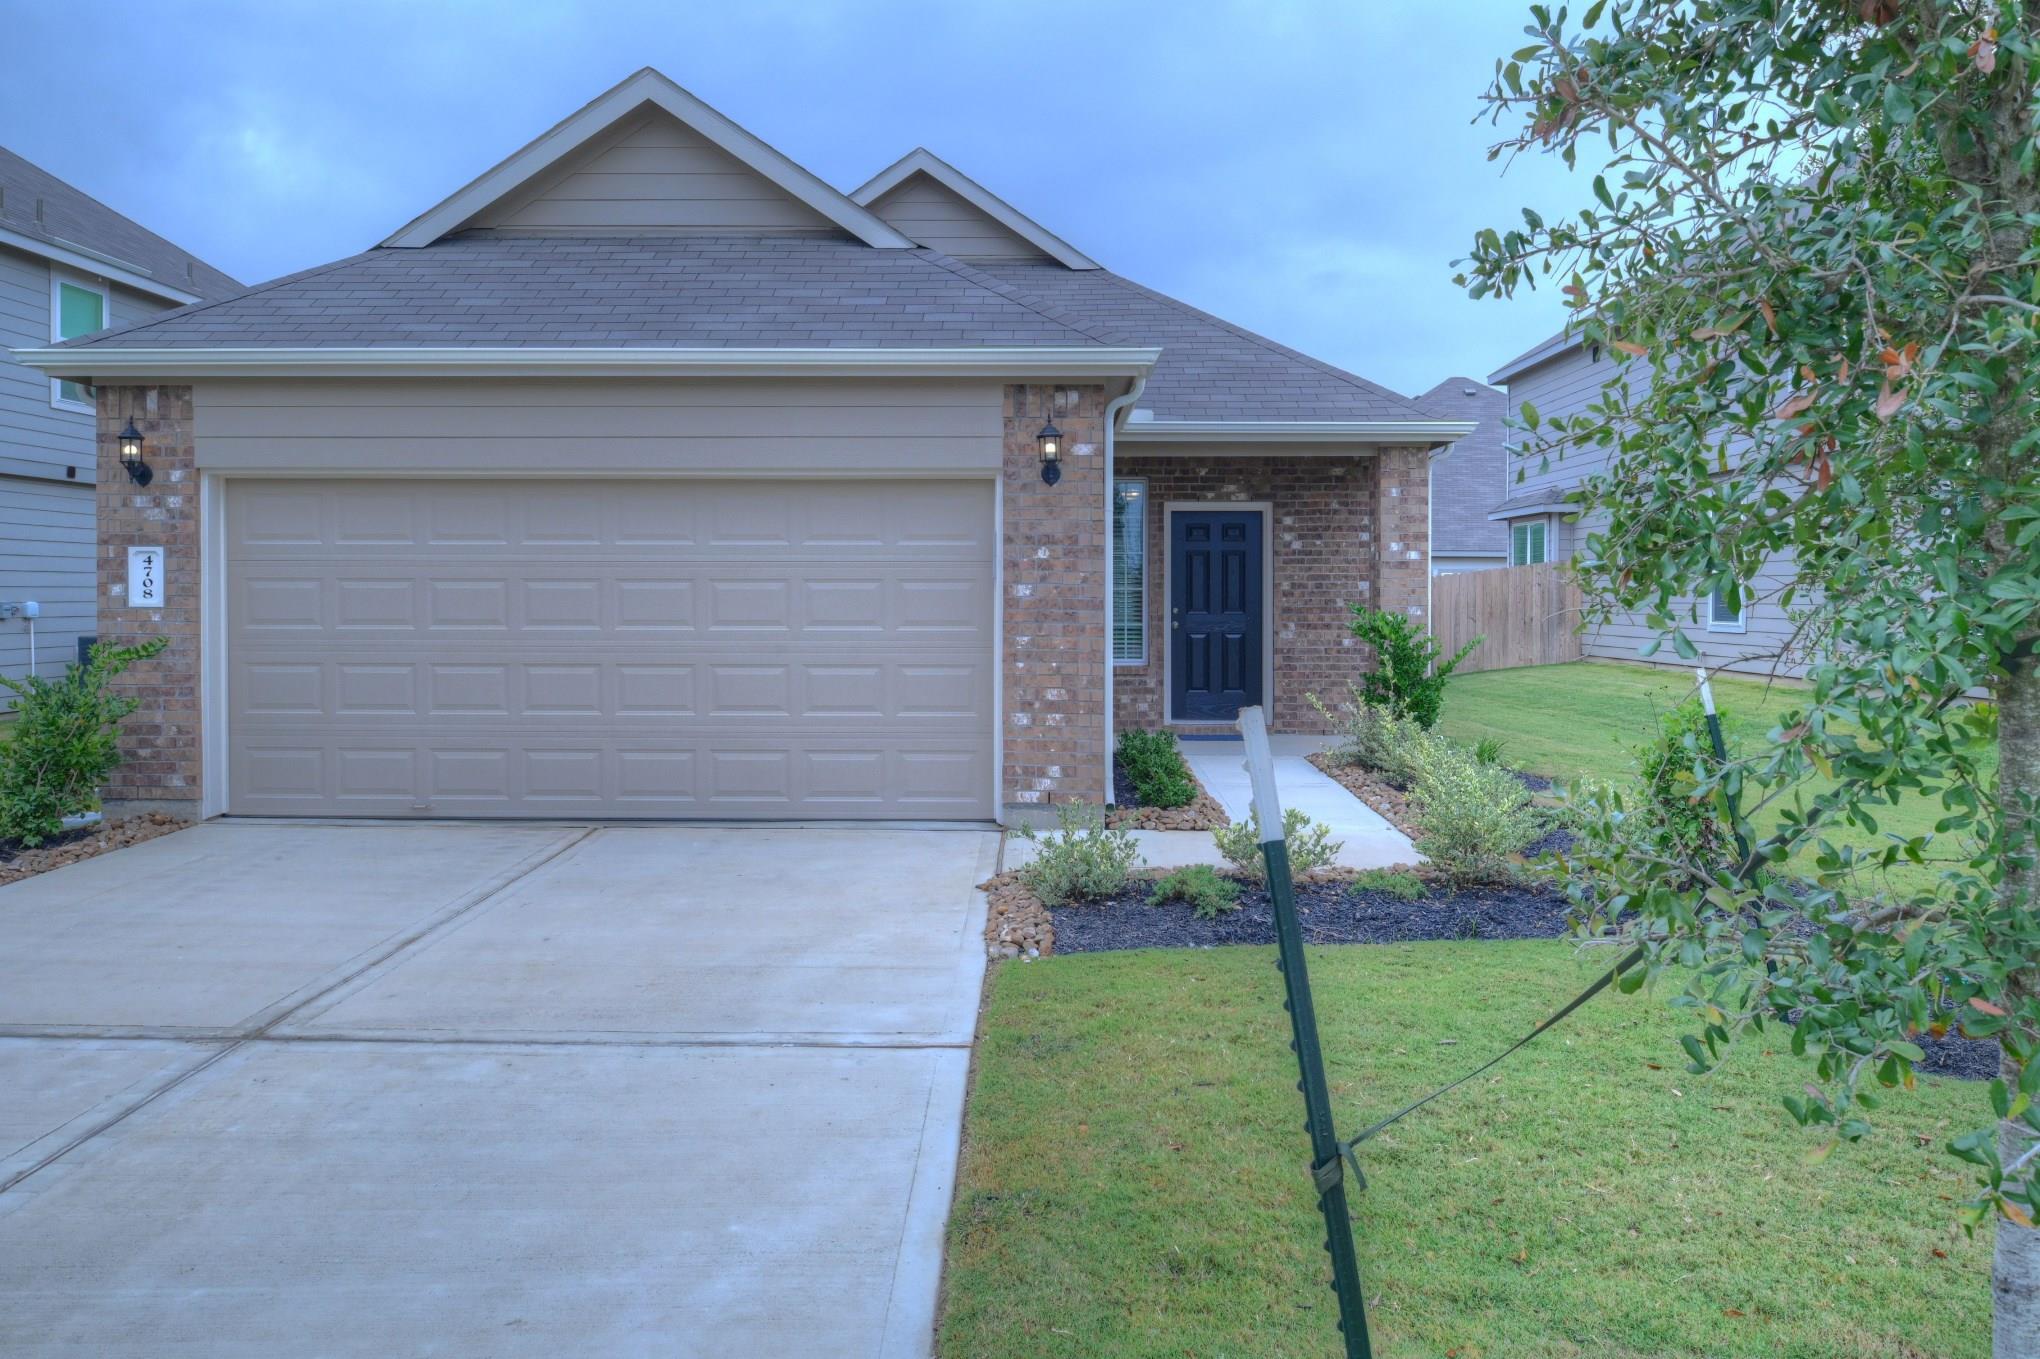 4708 Los Pines Way Property Photo - Bryan, TX real estate listing